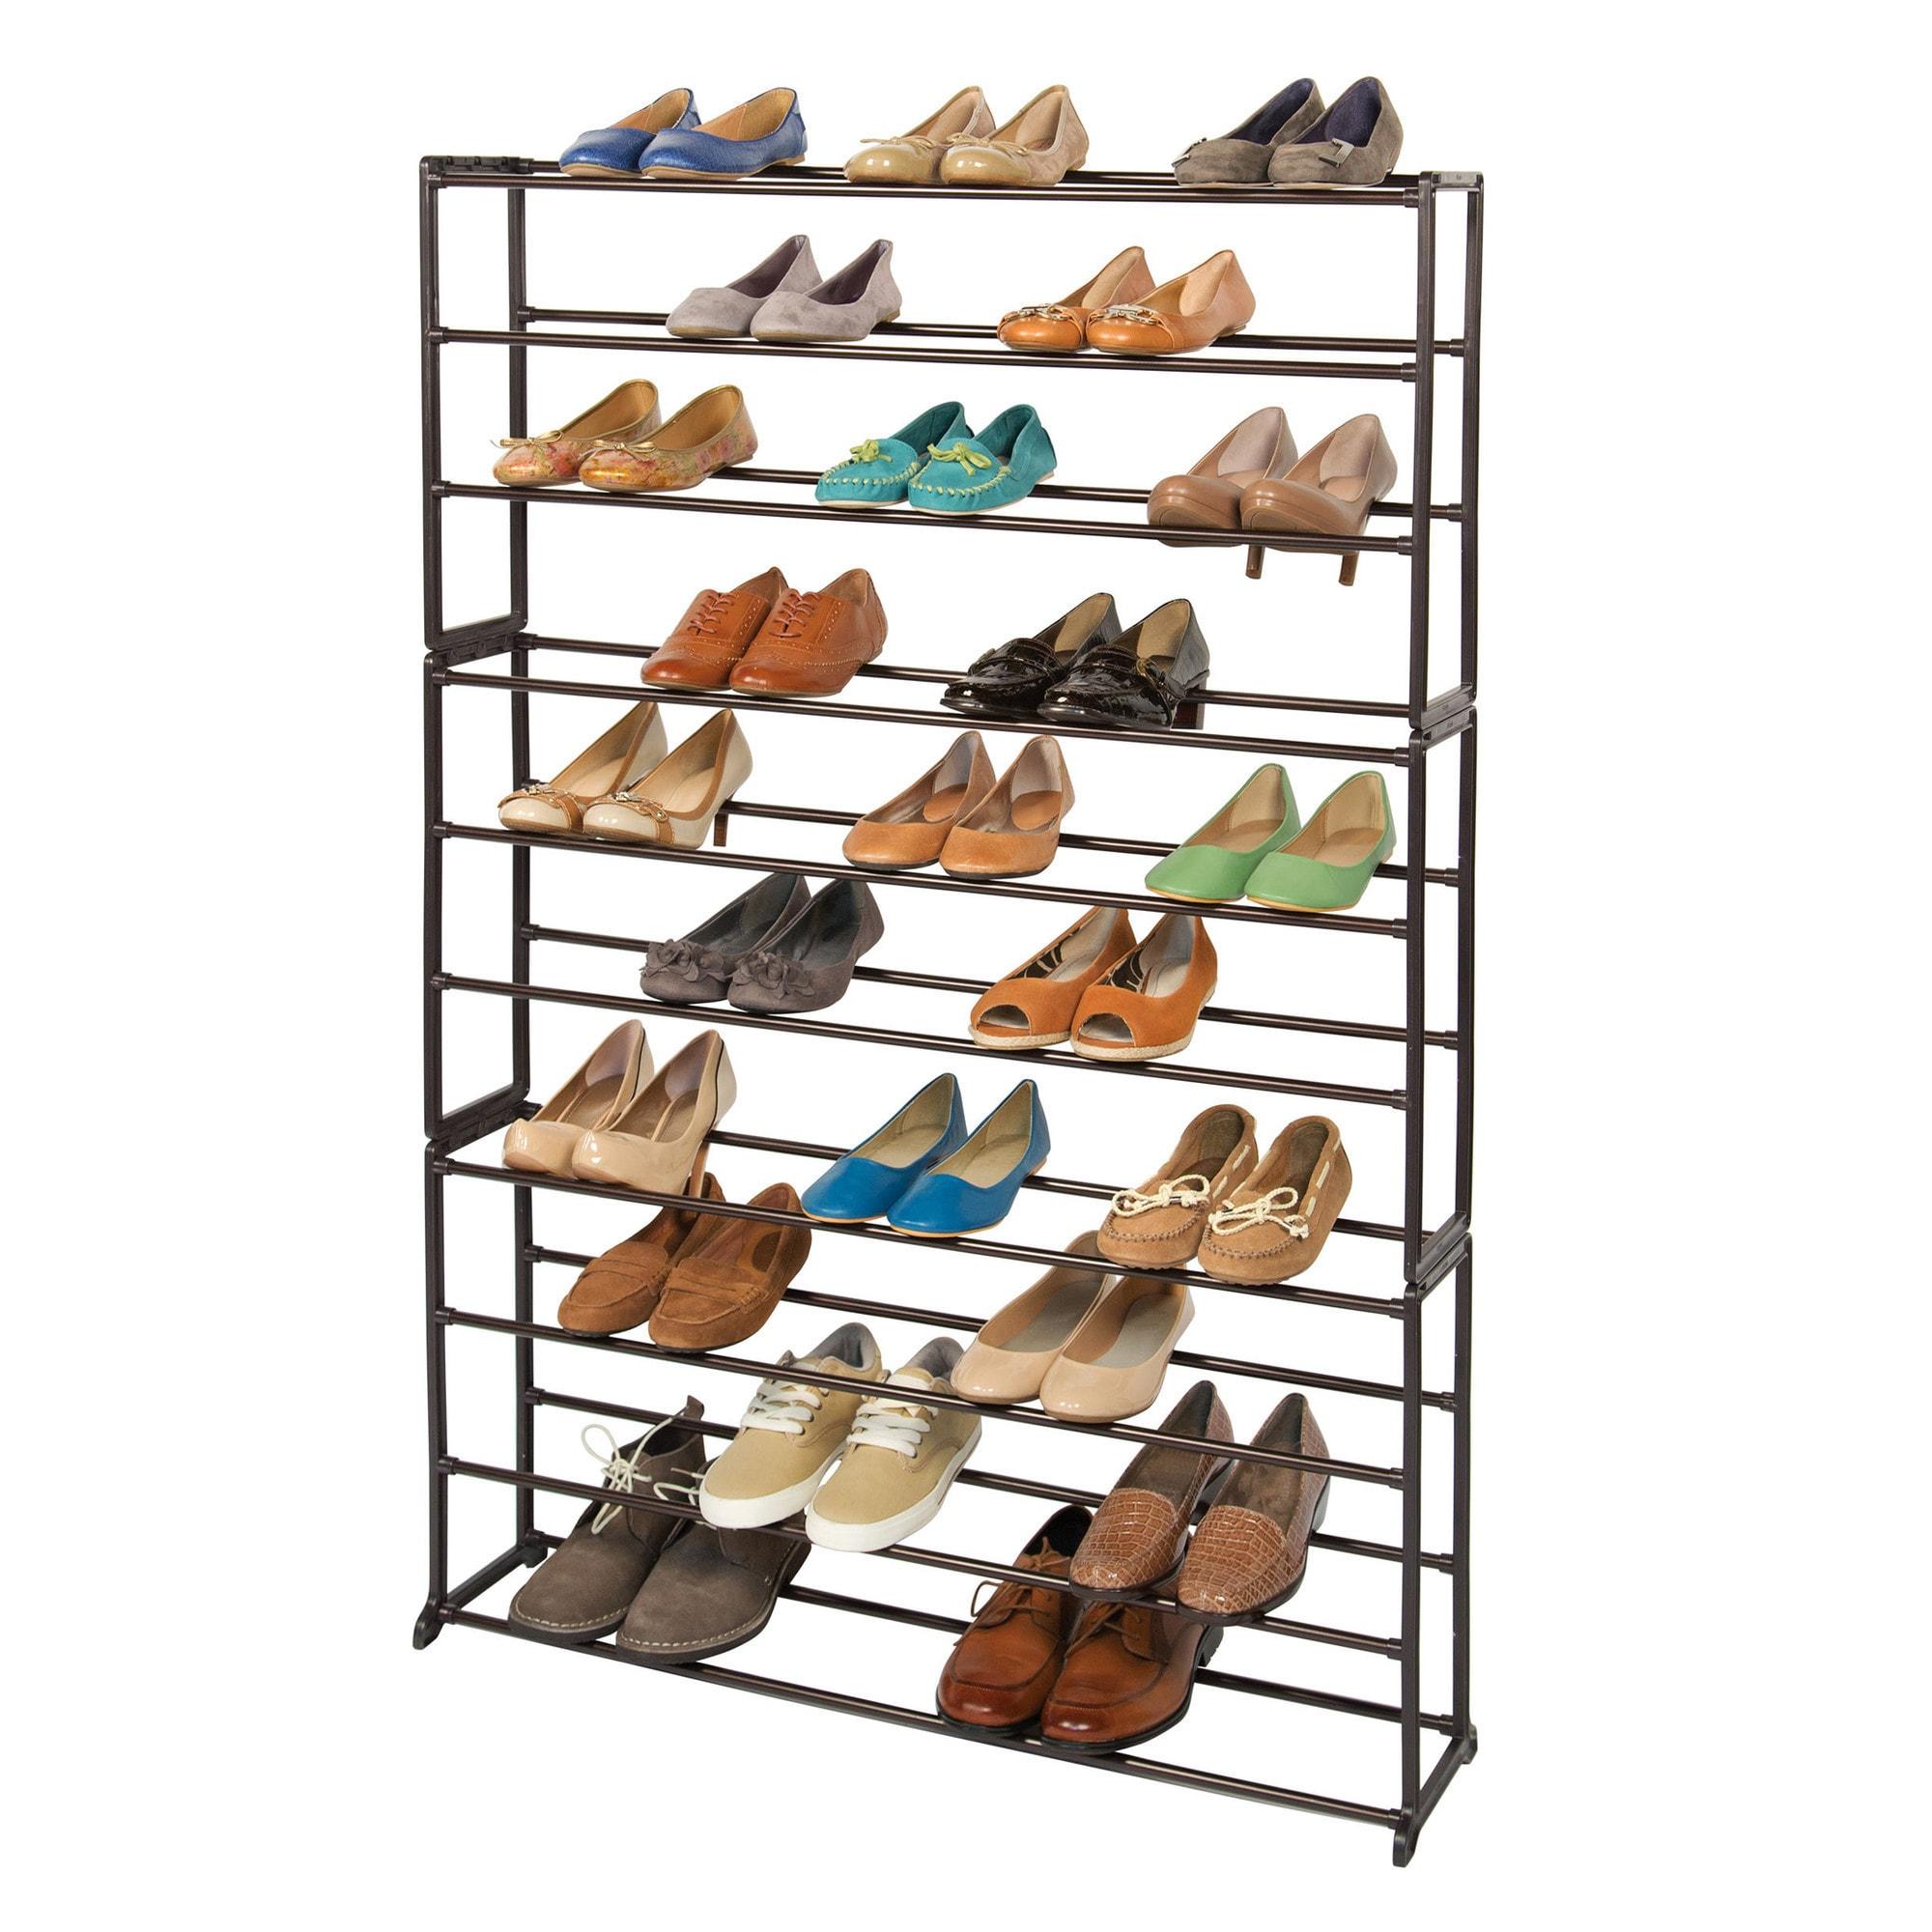 Richards Homewares 50-pair Standing Bronze Shoe Rack at Sears.com